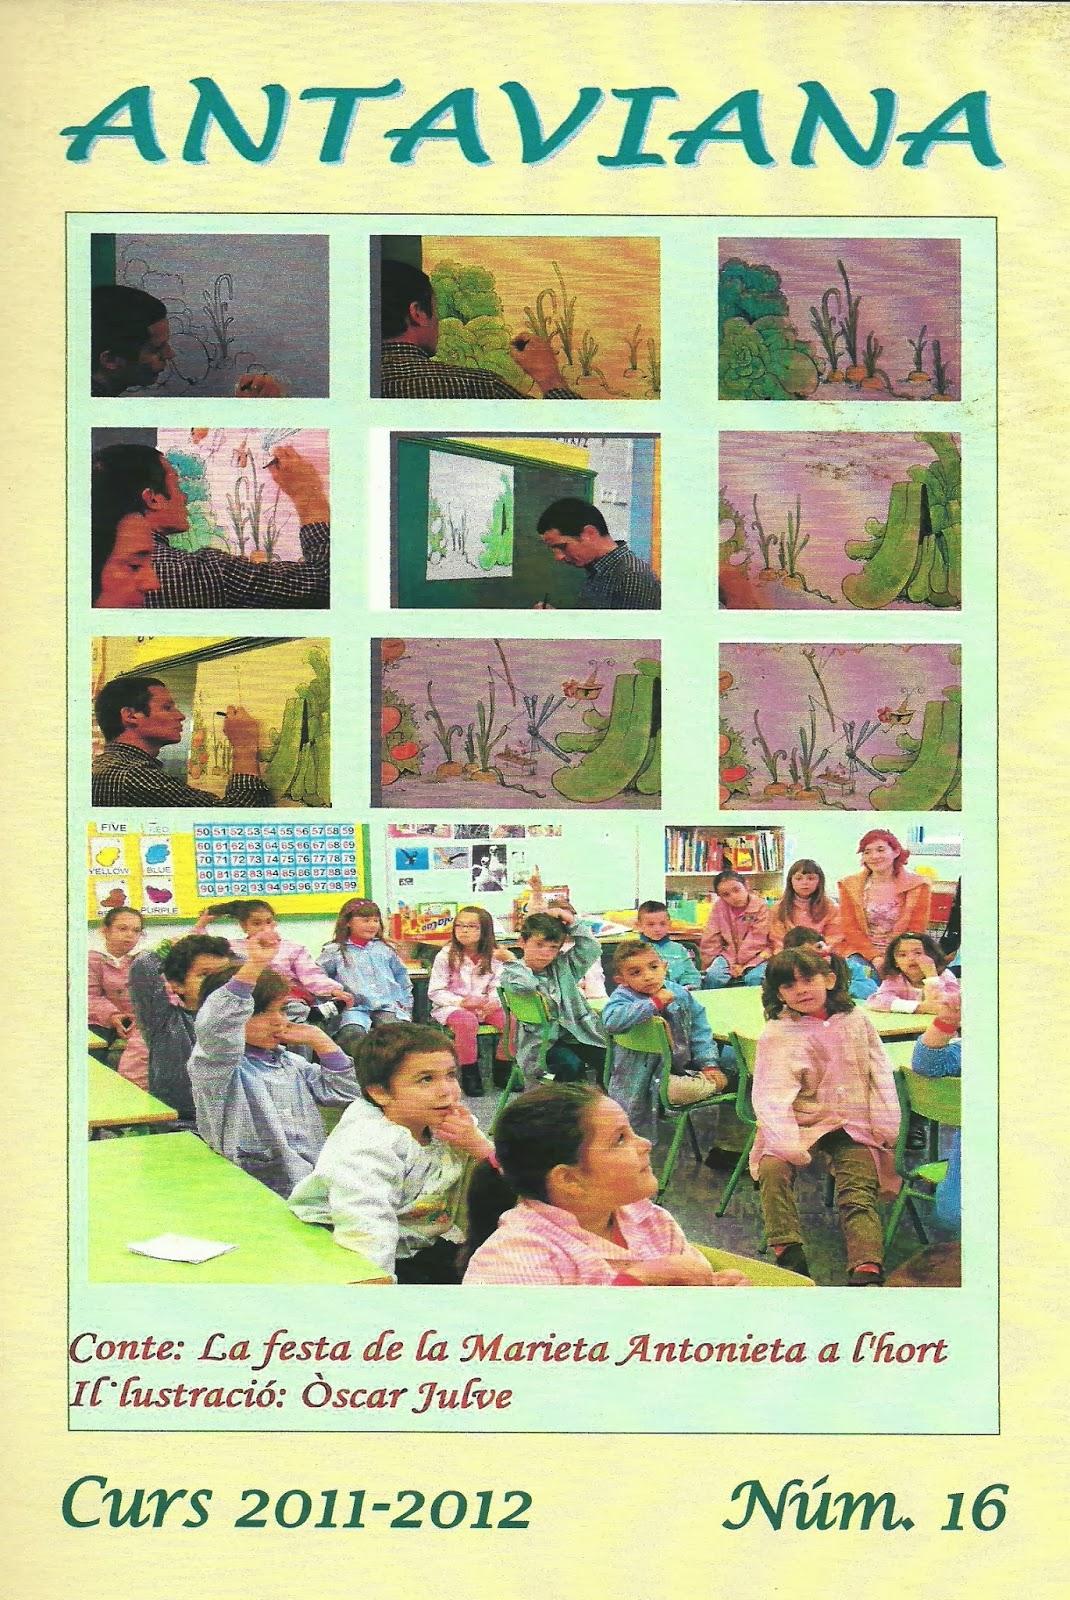 http://issuu.com/blocsdantaviana/docs/revista_antaviana_n___16__2011-2012